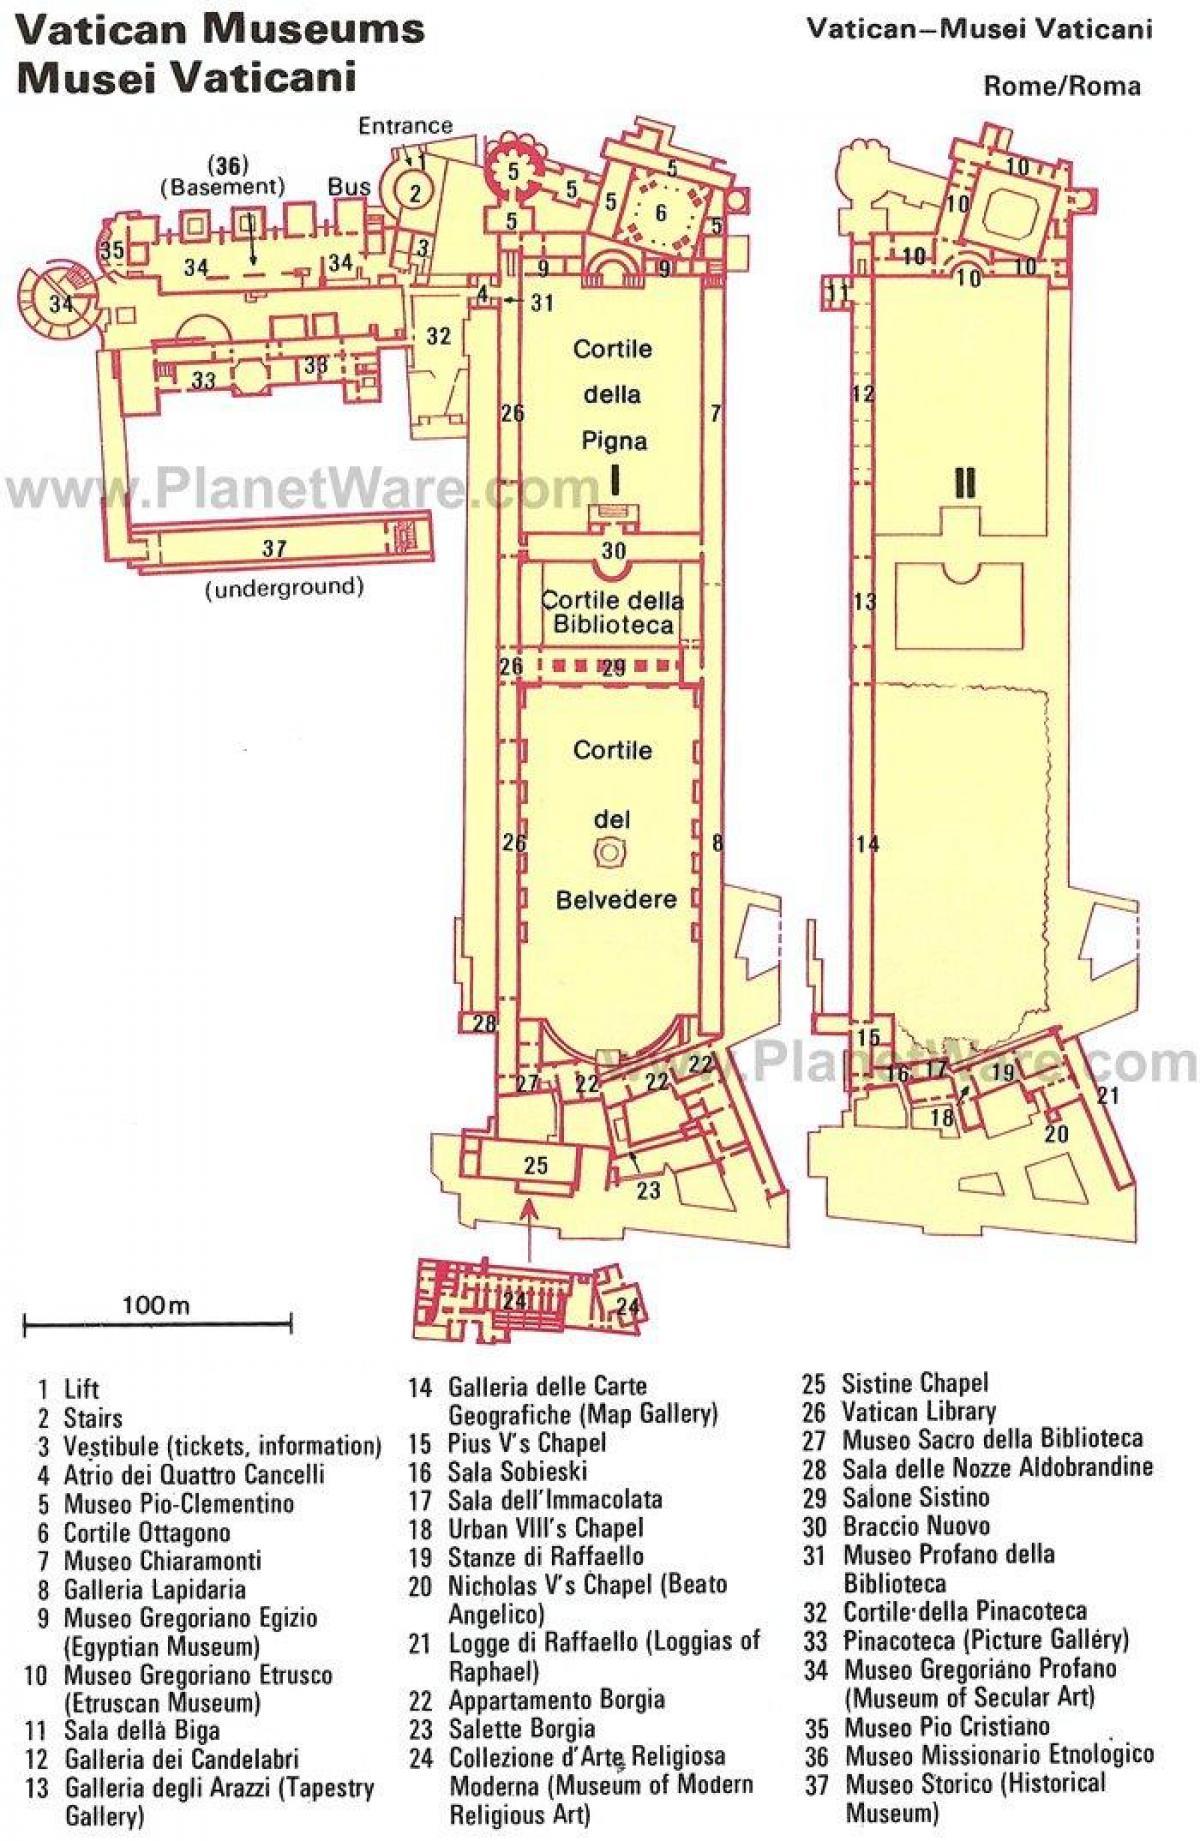 Kort Vatican Museum Layout Kort Af Vatikanet Museum Layout